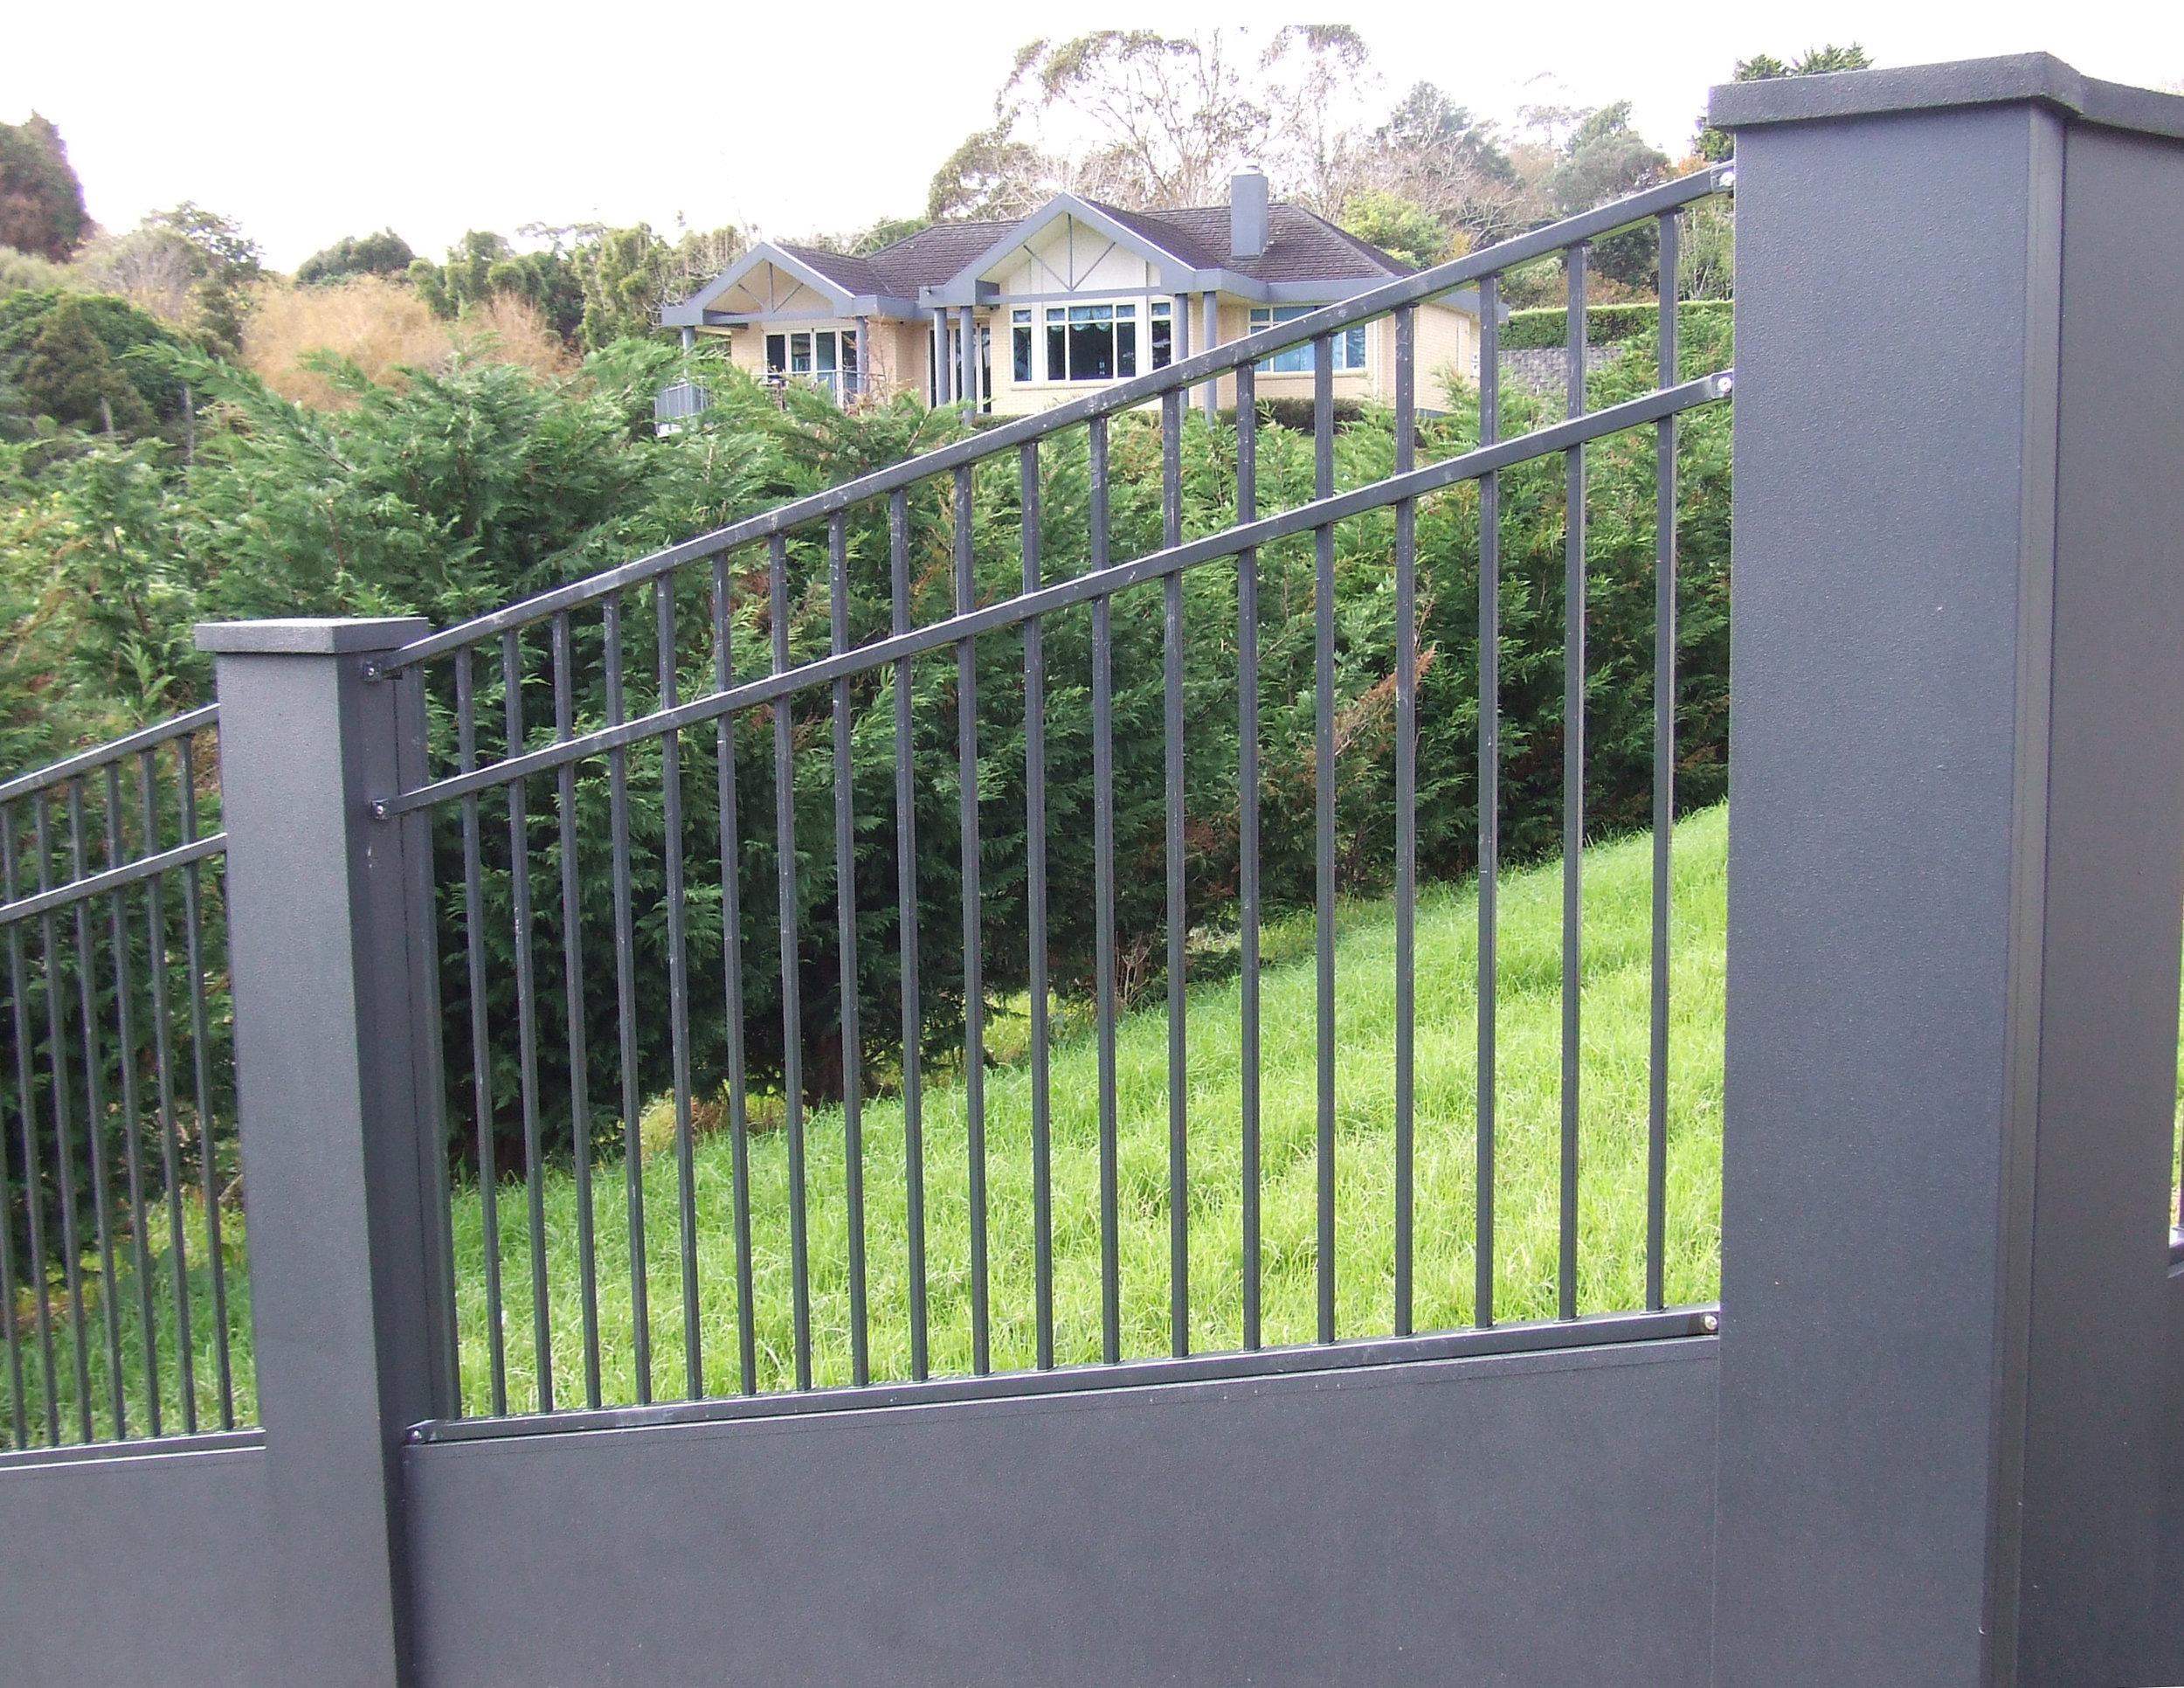 (17) Raked steel panel between plastered steel